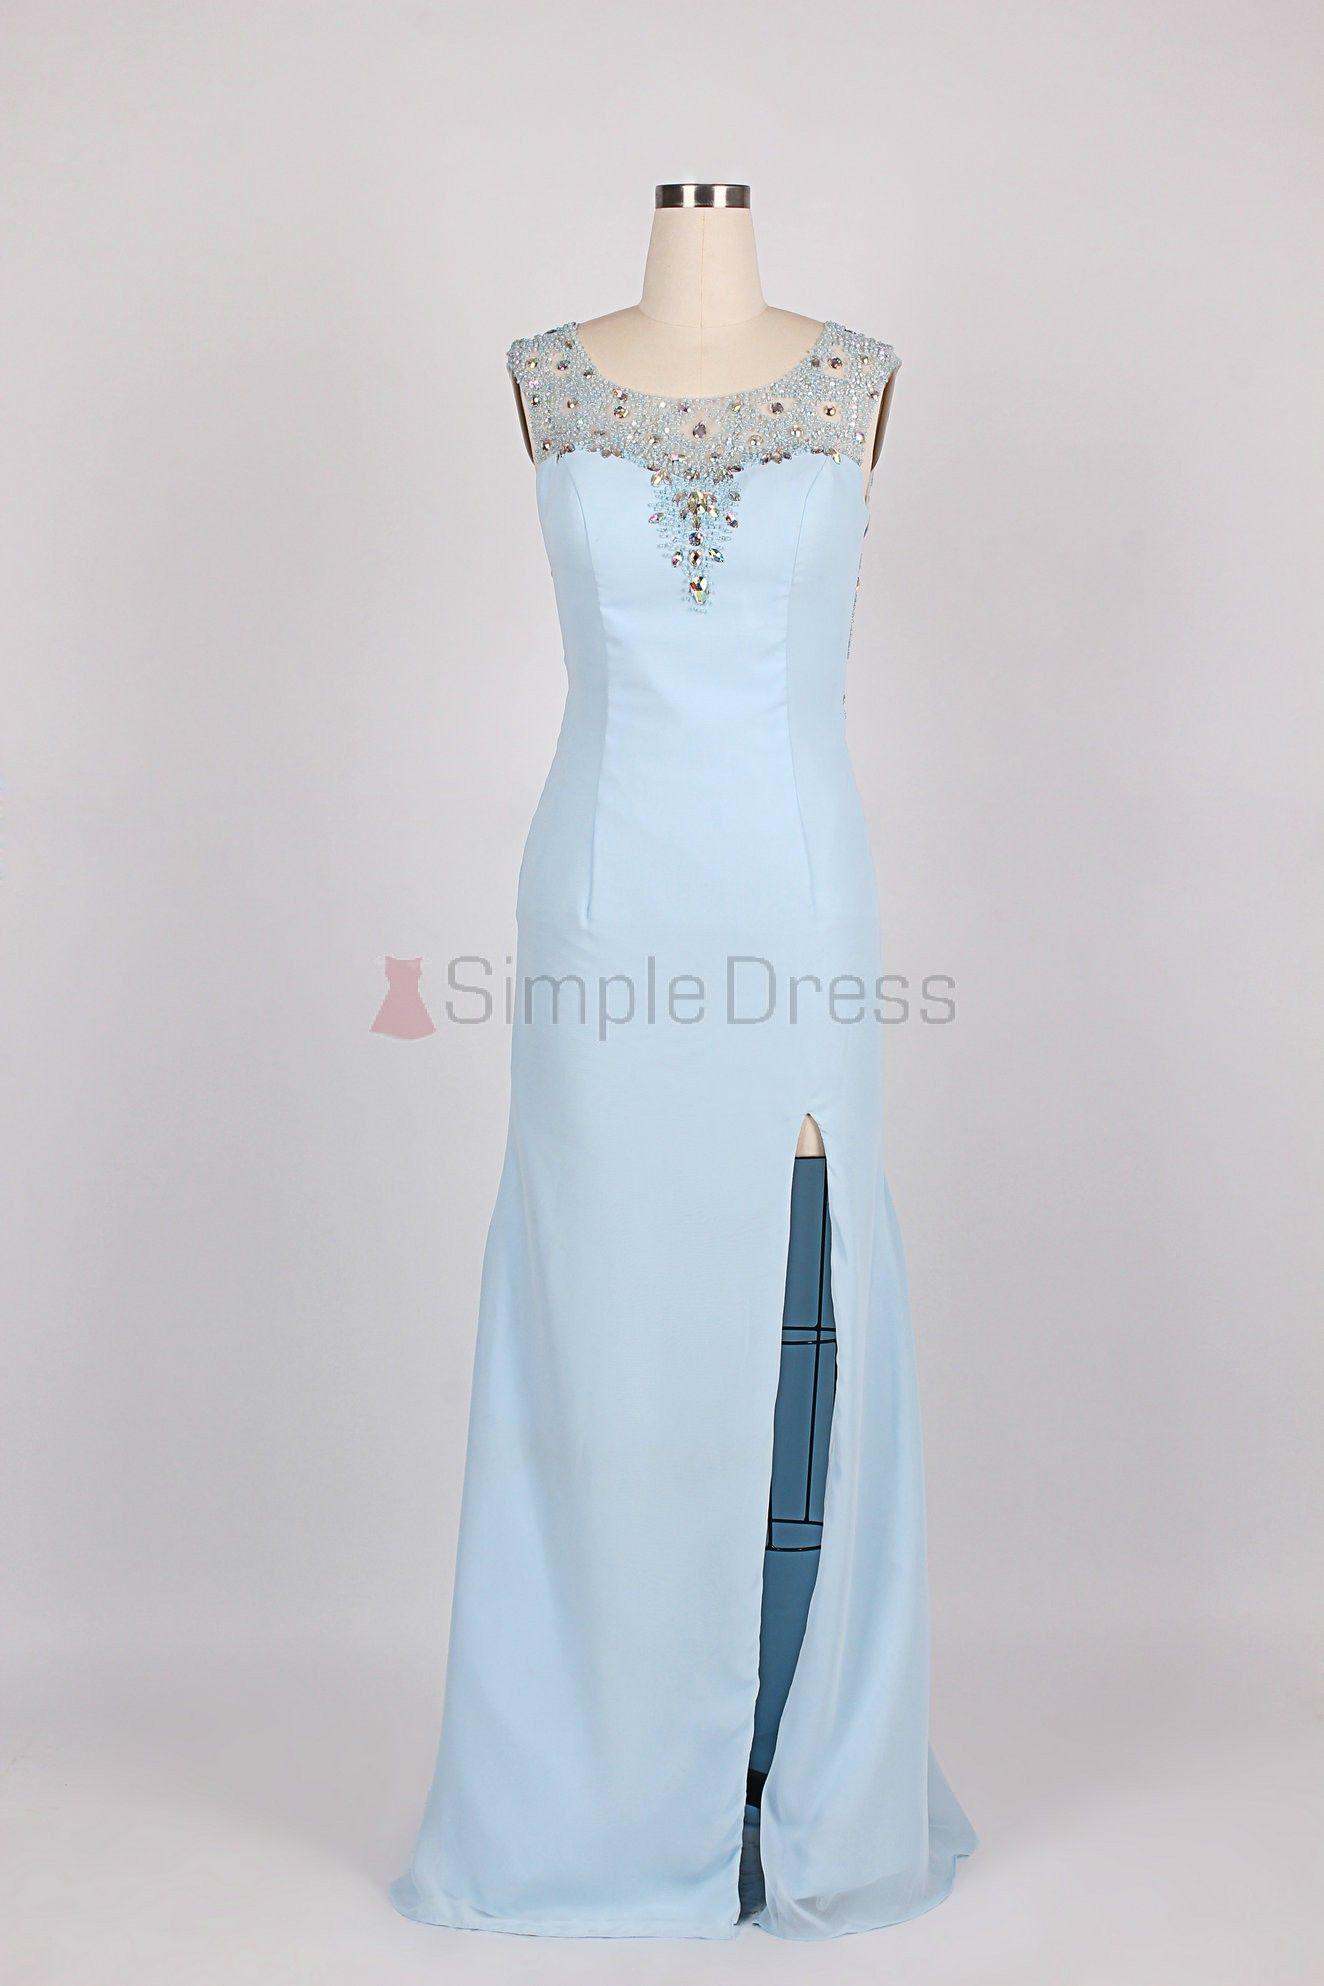 Simple dress new beading scoop side slit openback long chiffon prom